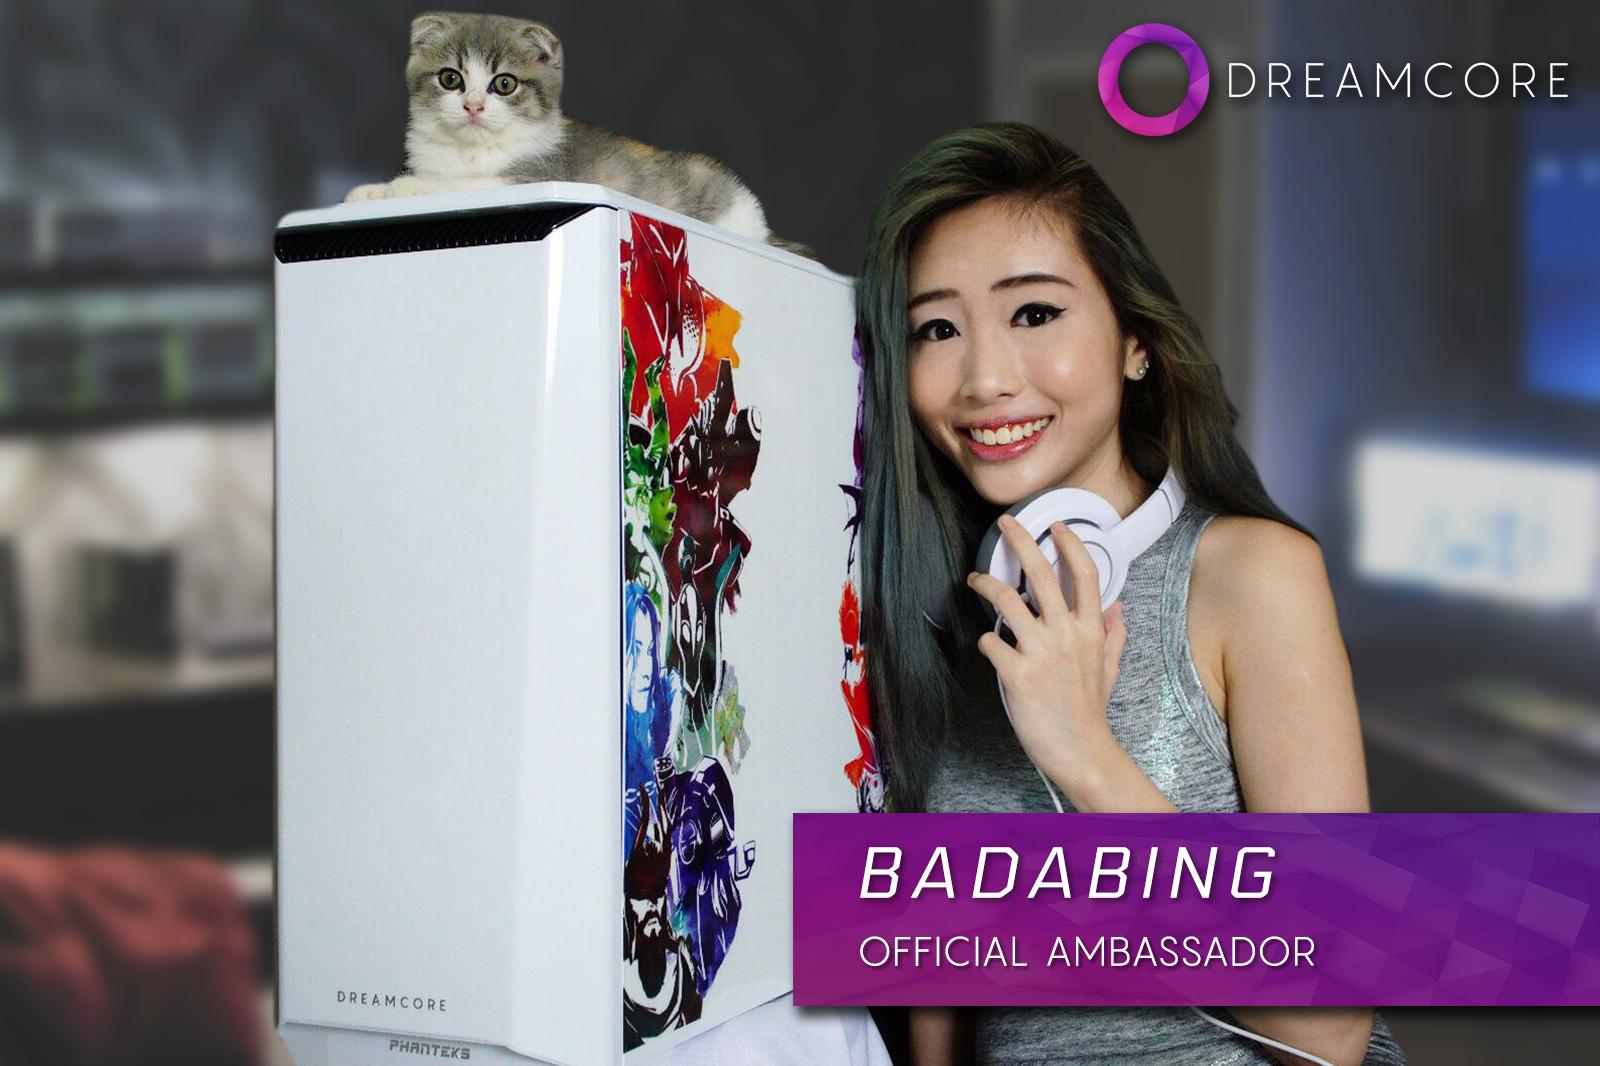 Badabing - Dreamcore's new ambassador